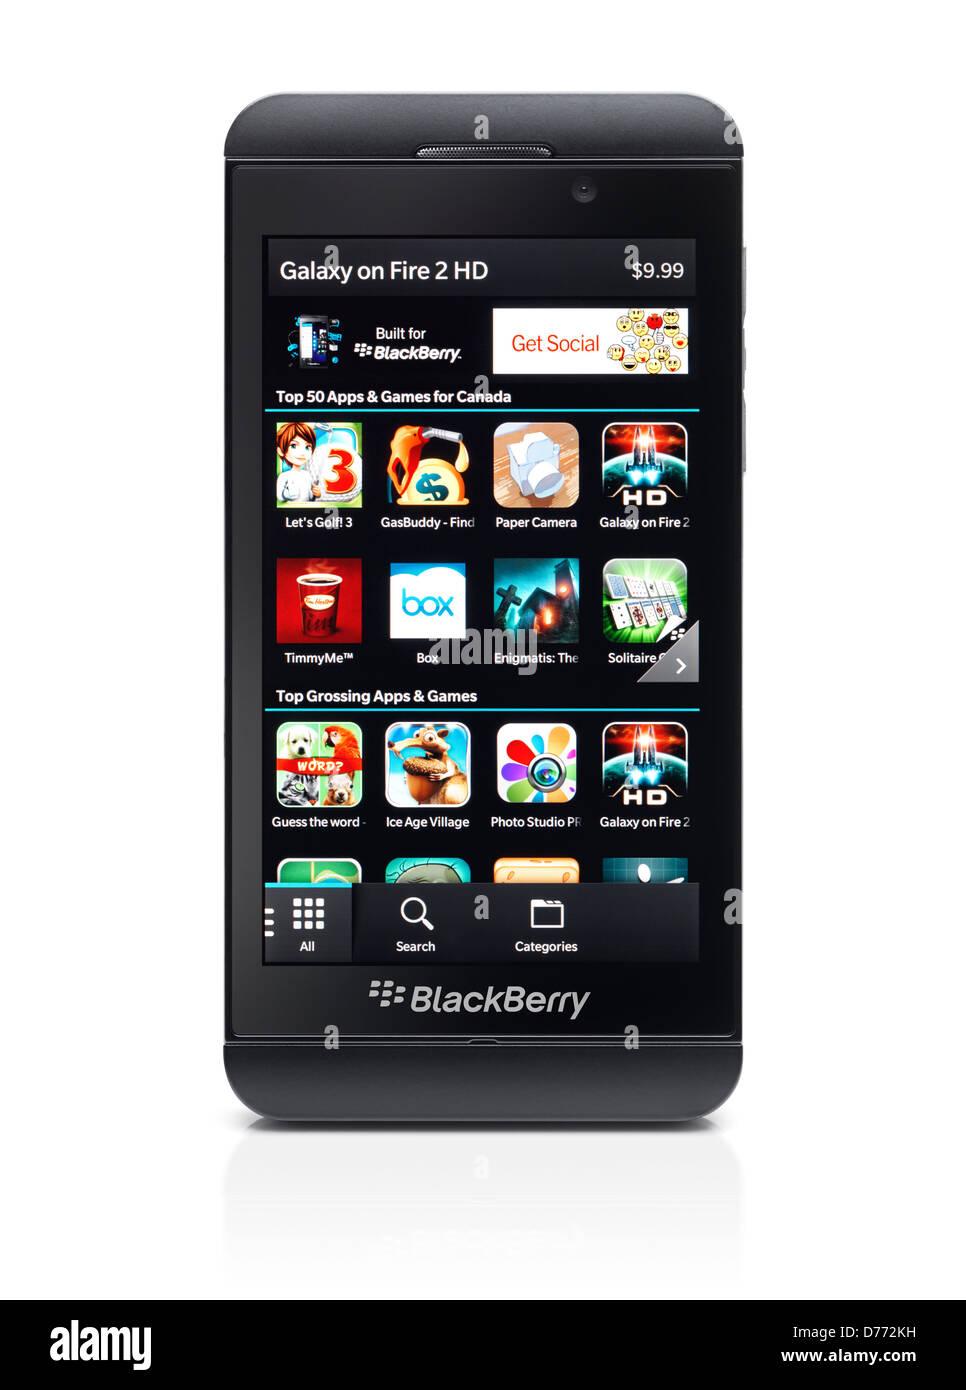 Z10 smartphone Blackberry con Blackberry World app store en su pantalla. Teléfono negro aislado sobre fondo Imagen De Stock